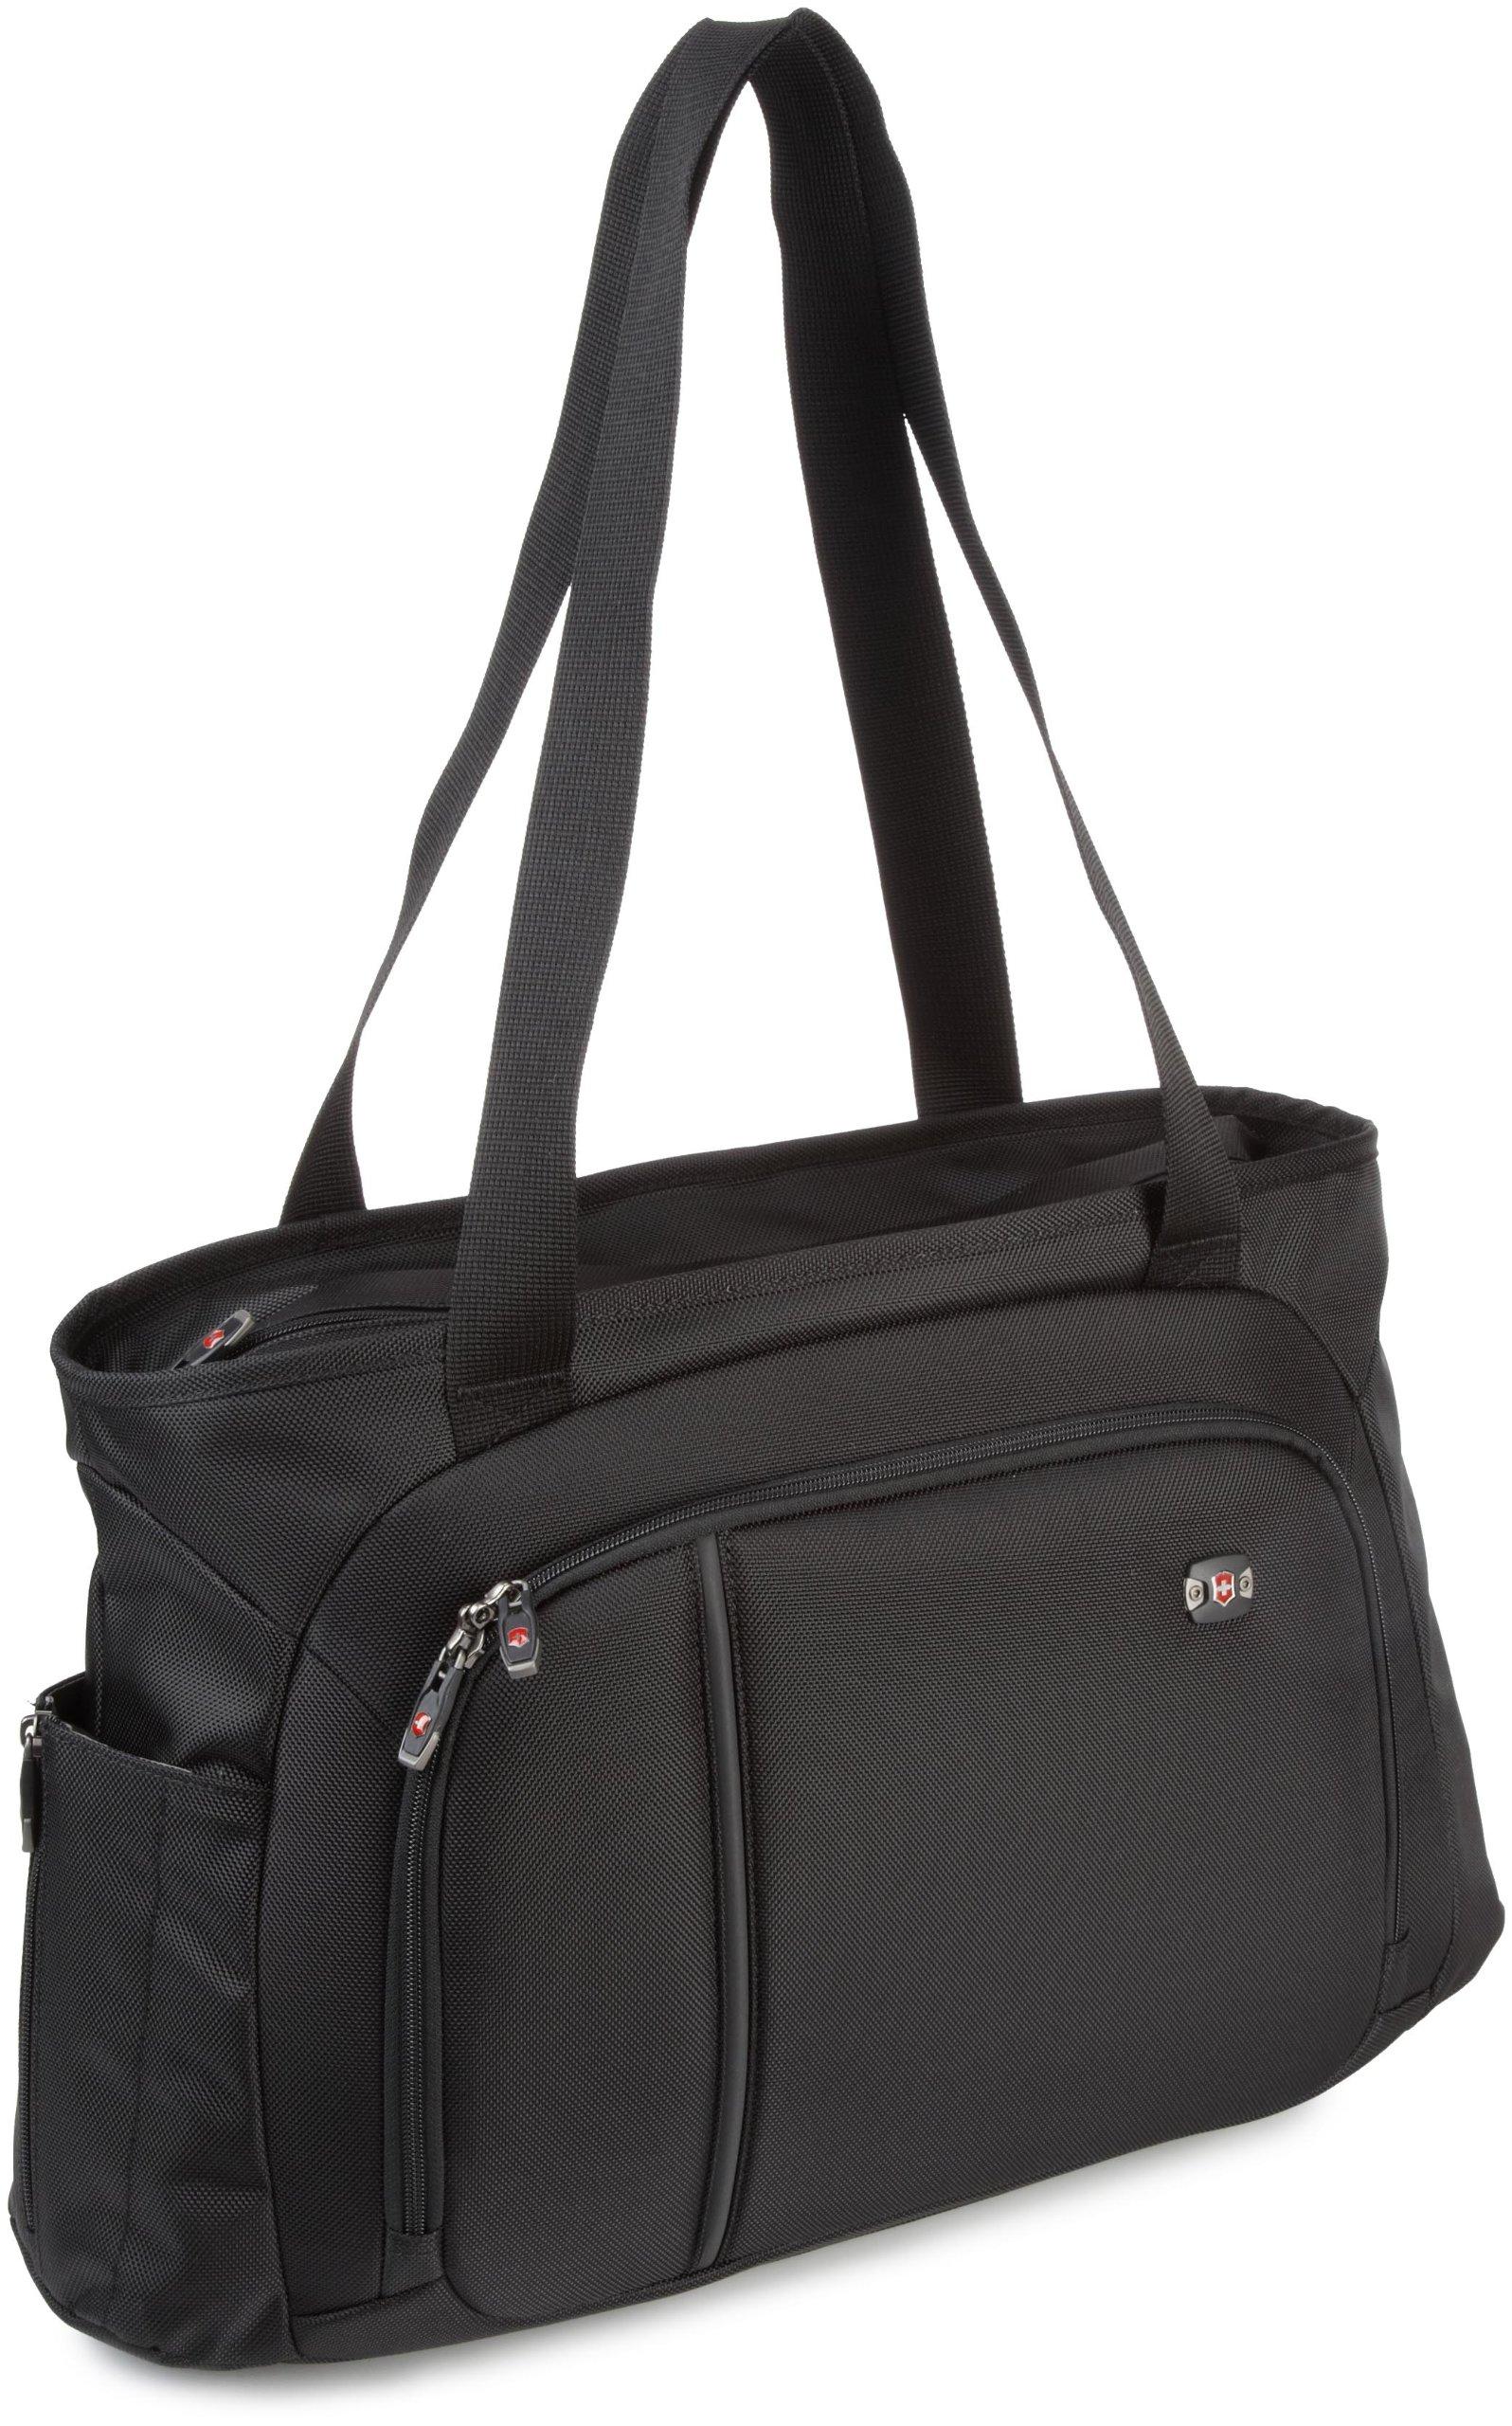 Victorinox Luggage Werks Traveler 4.0 Wt Shopping Tote Bag, Black, One Size by Victorinox